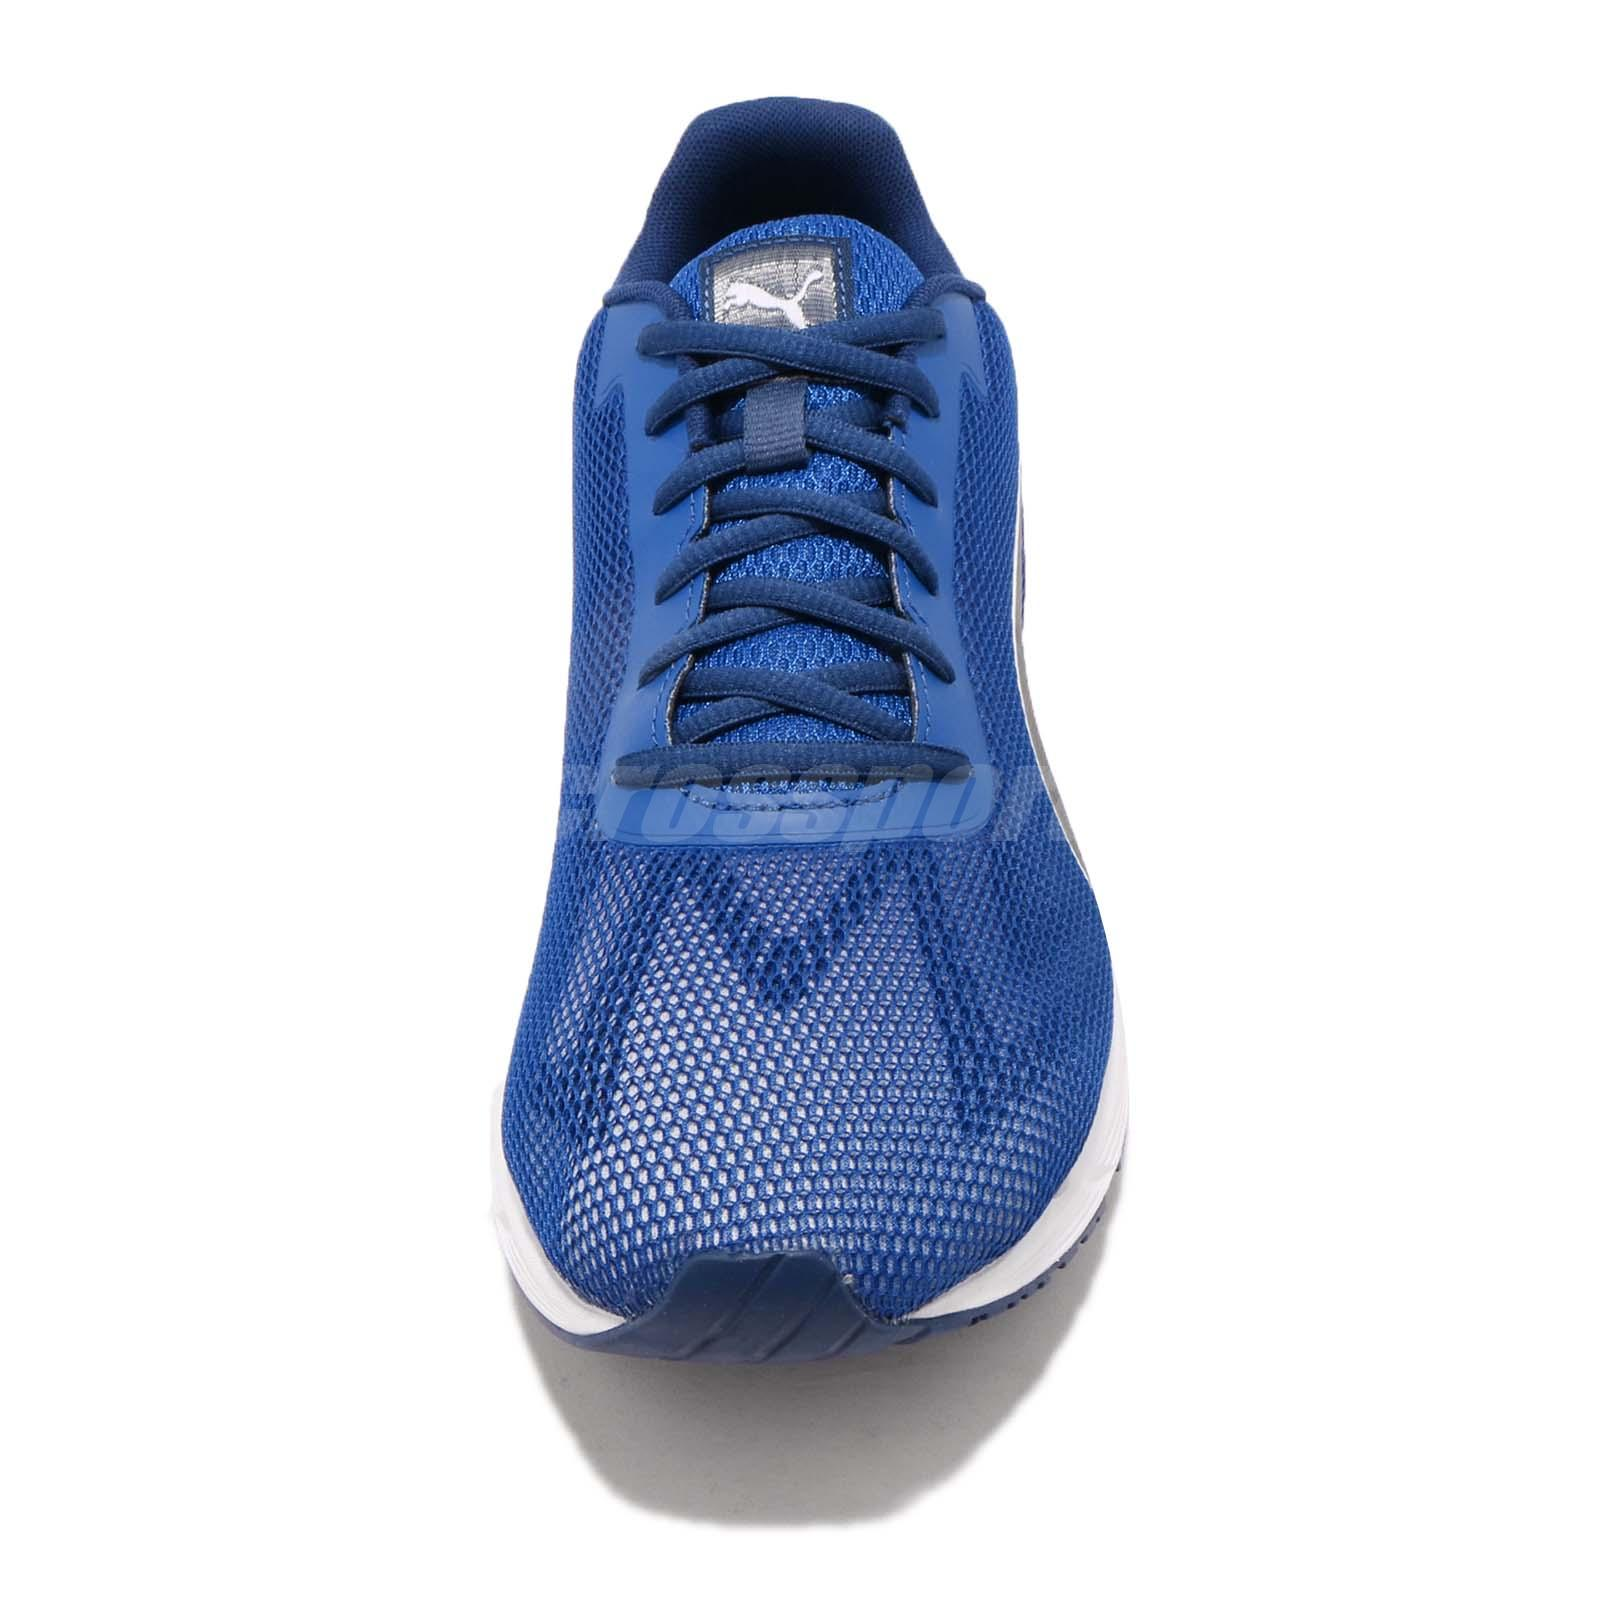 Motor Puma Azul Preto Branco Masculino Tênis de corrida Athletics ... 7cae53fee2e15